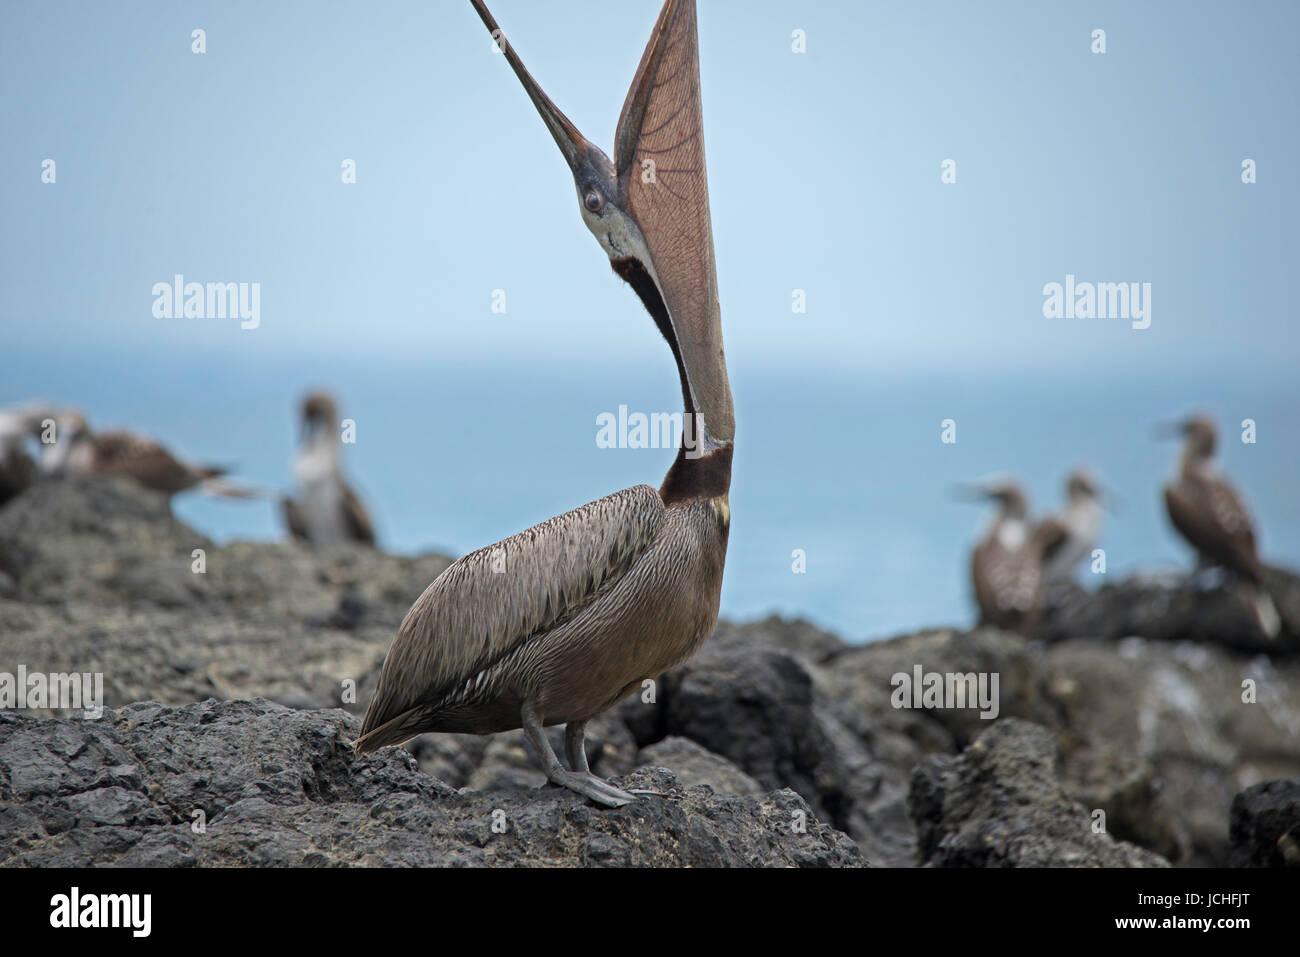 Brown pelican yawning - Stock Image